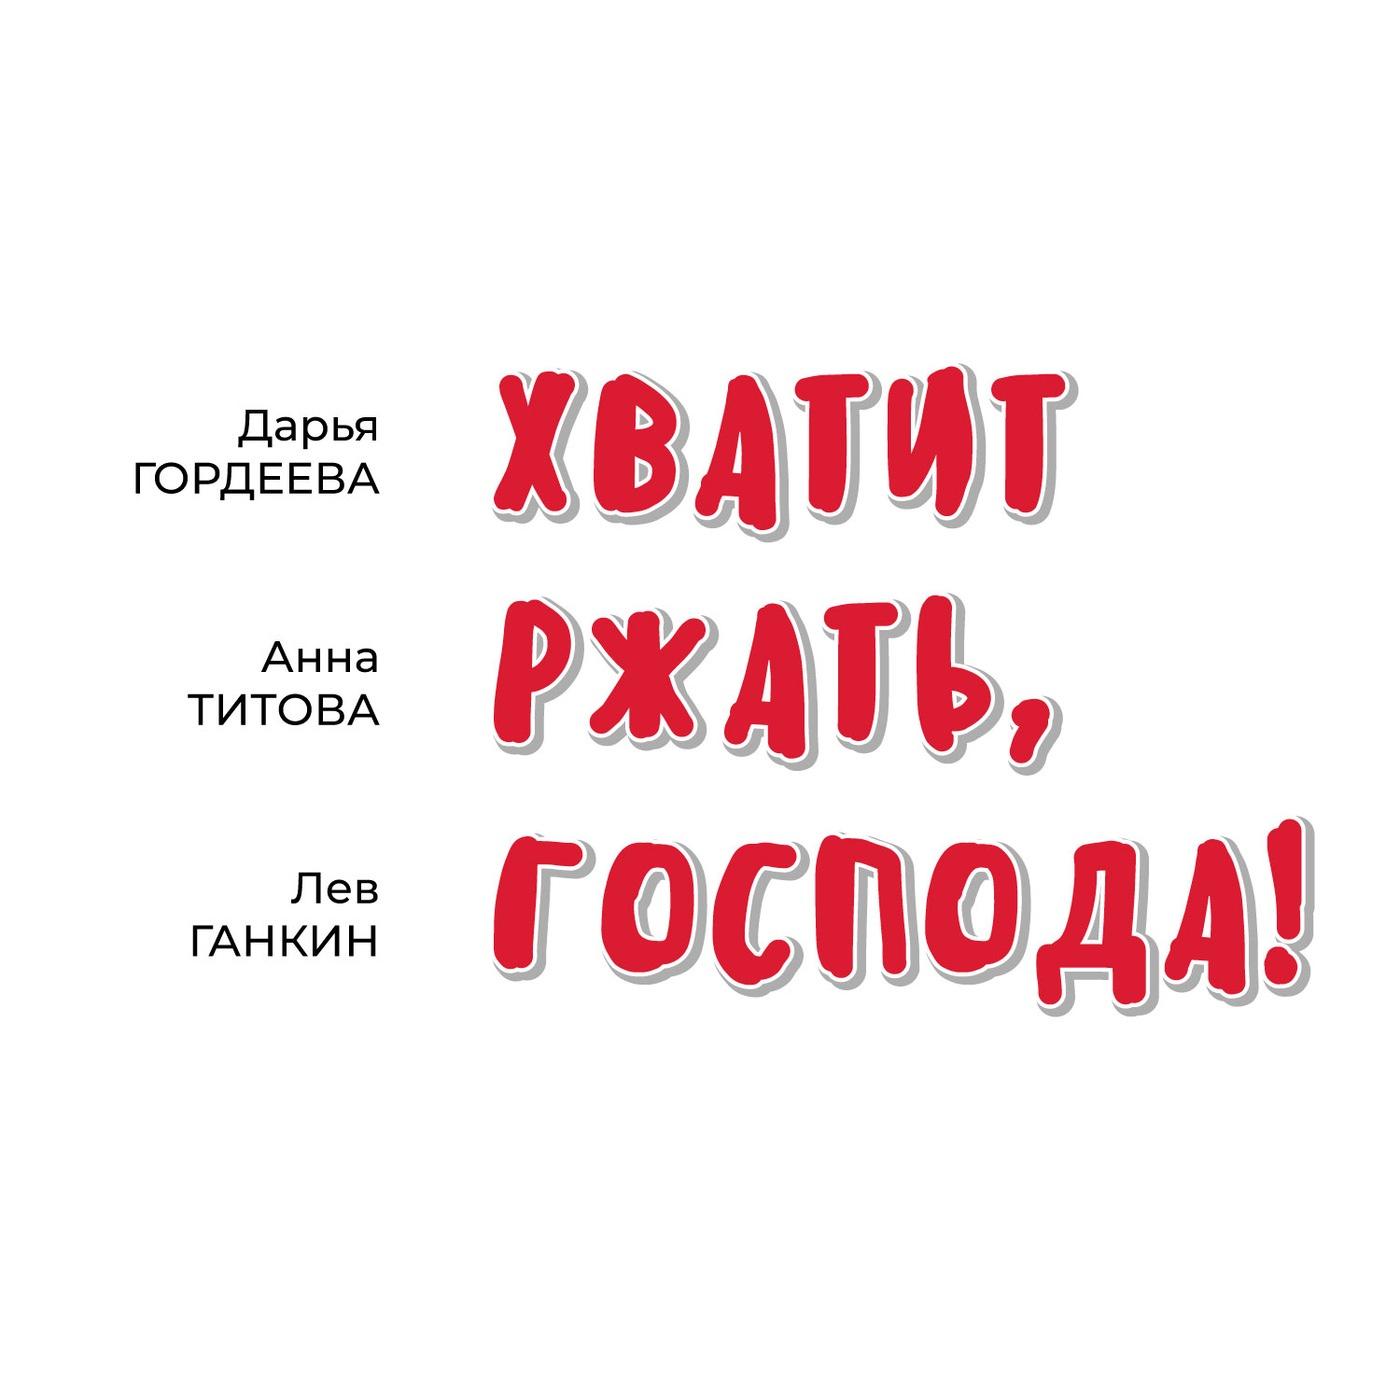 Гордеева в стриптиз-клубе, Феодора Васильевна Мегалодон и конец первого сезона